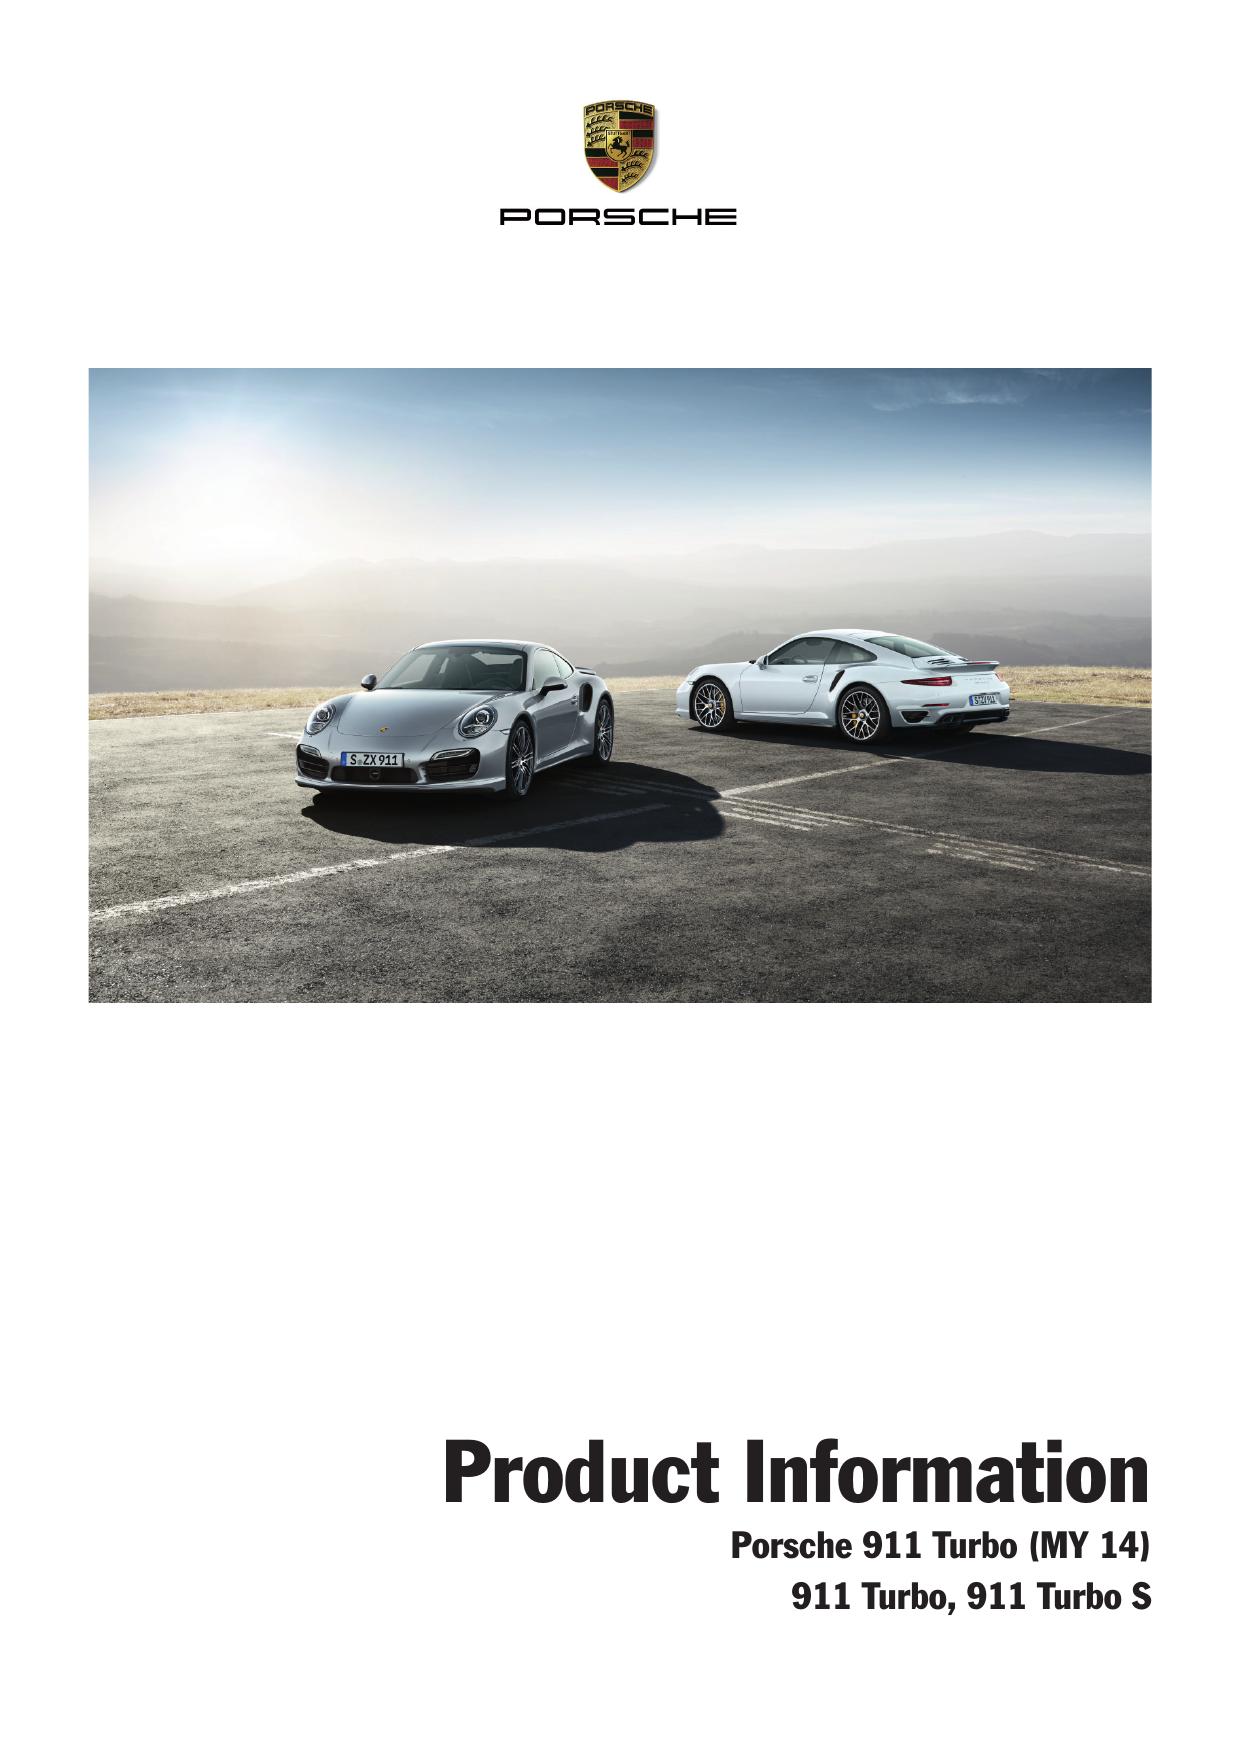 Product Information | manualzz com